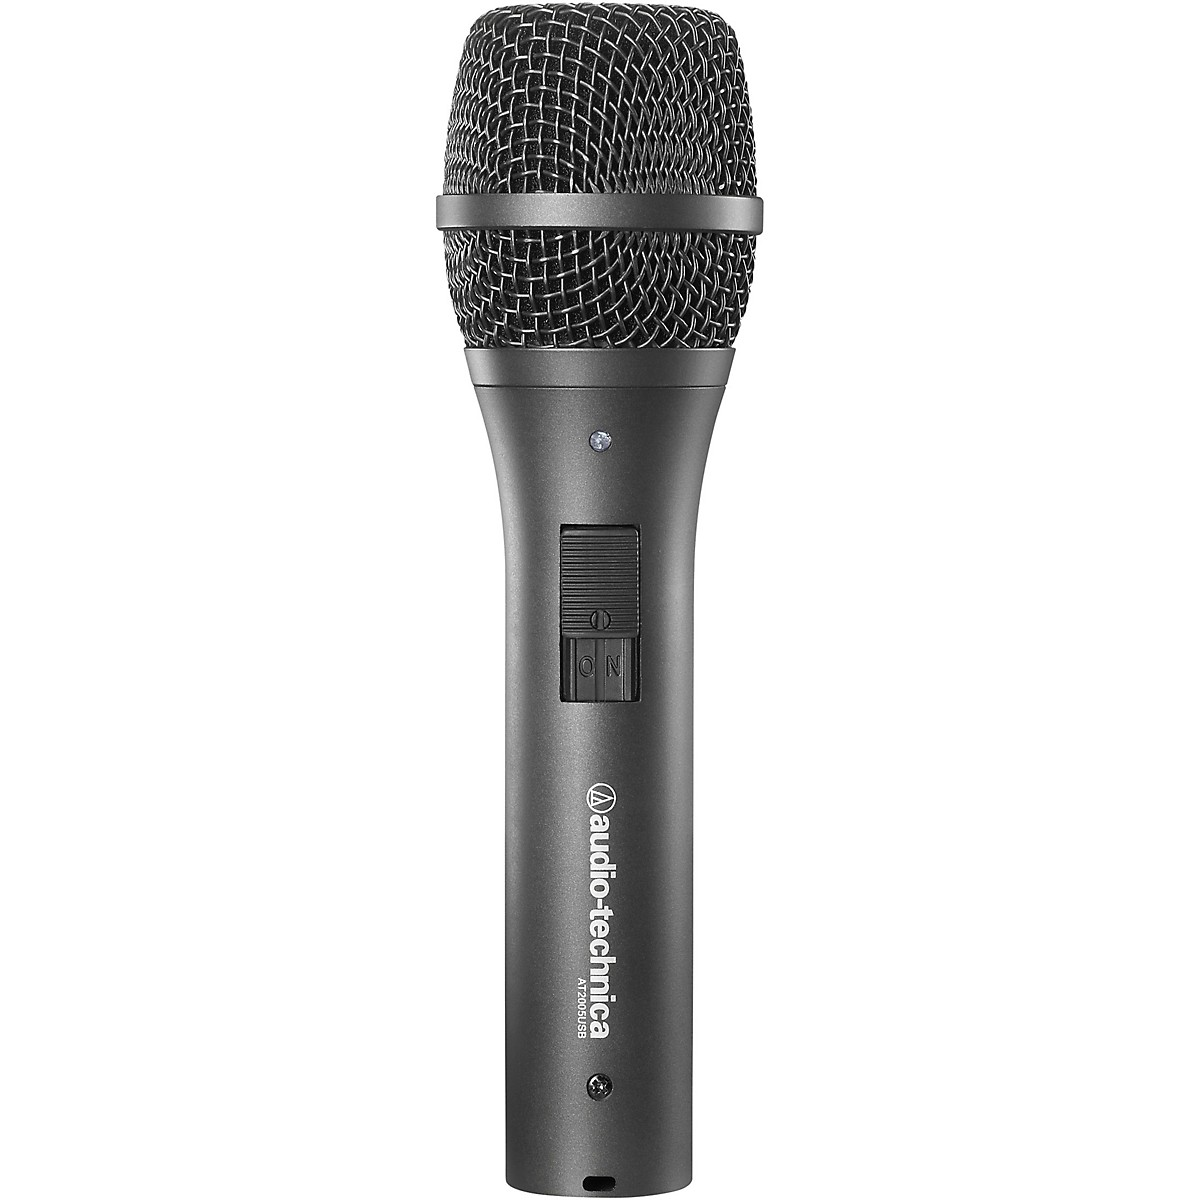 Audio-Technica AT2005USB Cardioid Dynamic Handheld USB/XLR Microphone